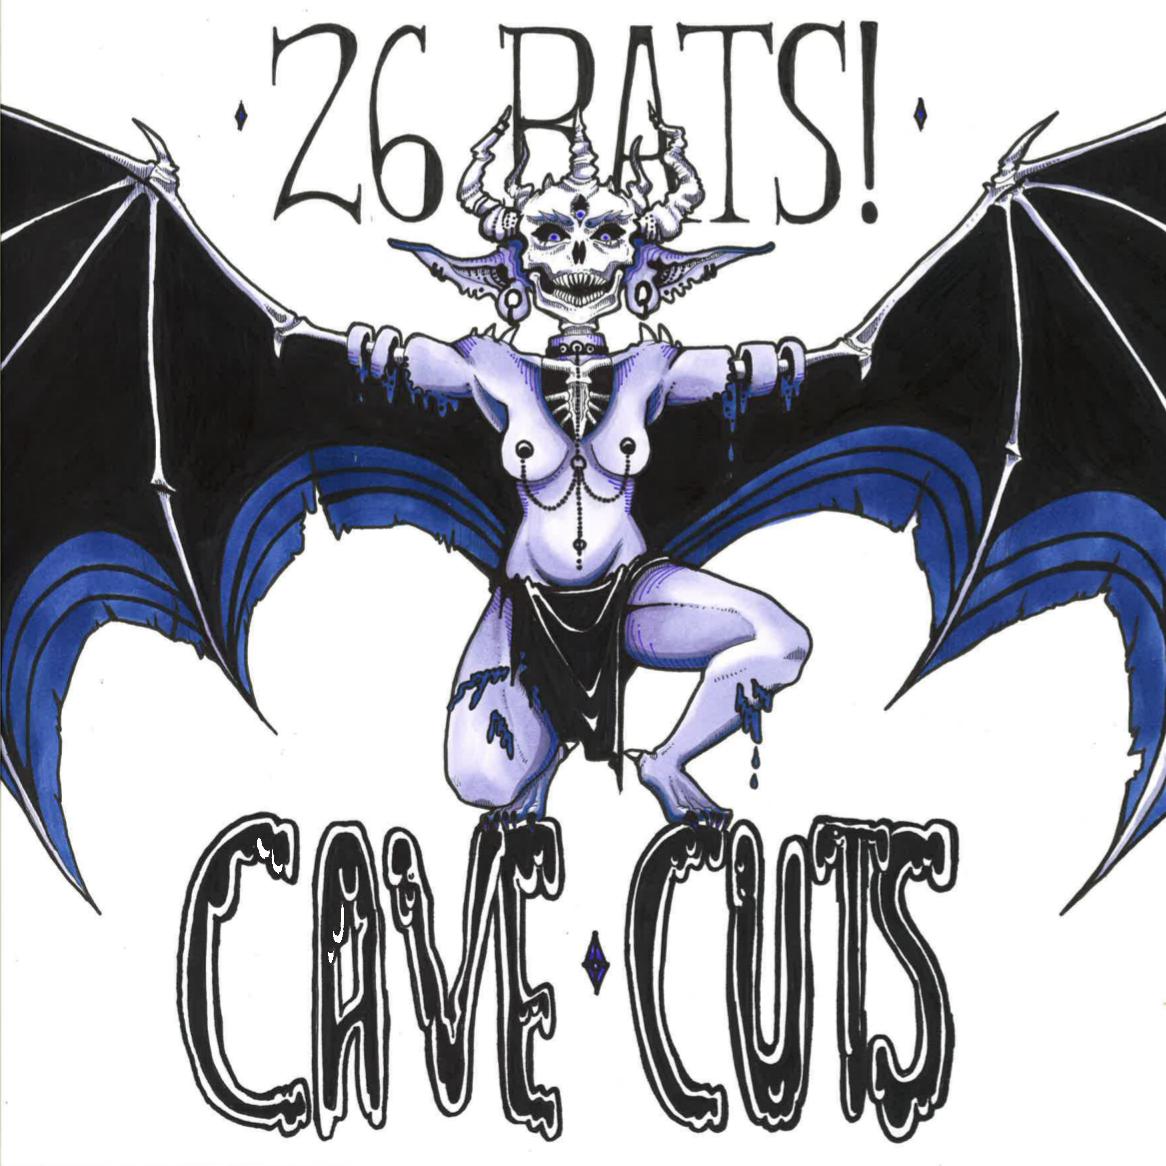 CaveCutsAlbumCover.jpg